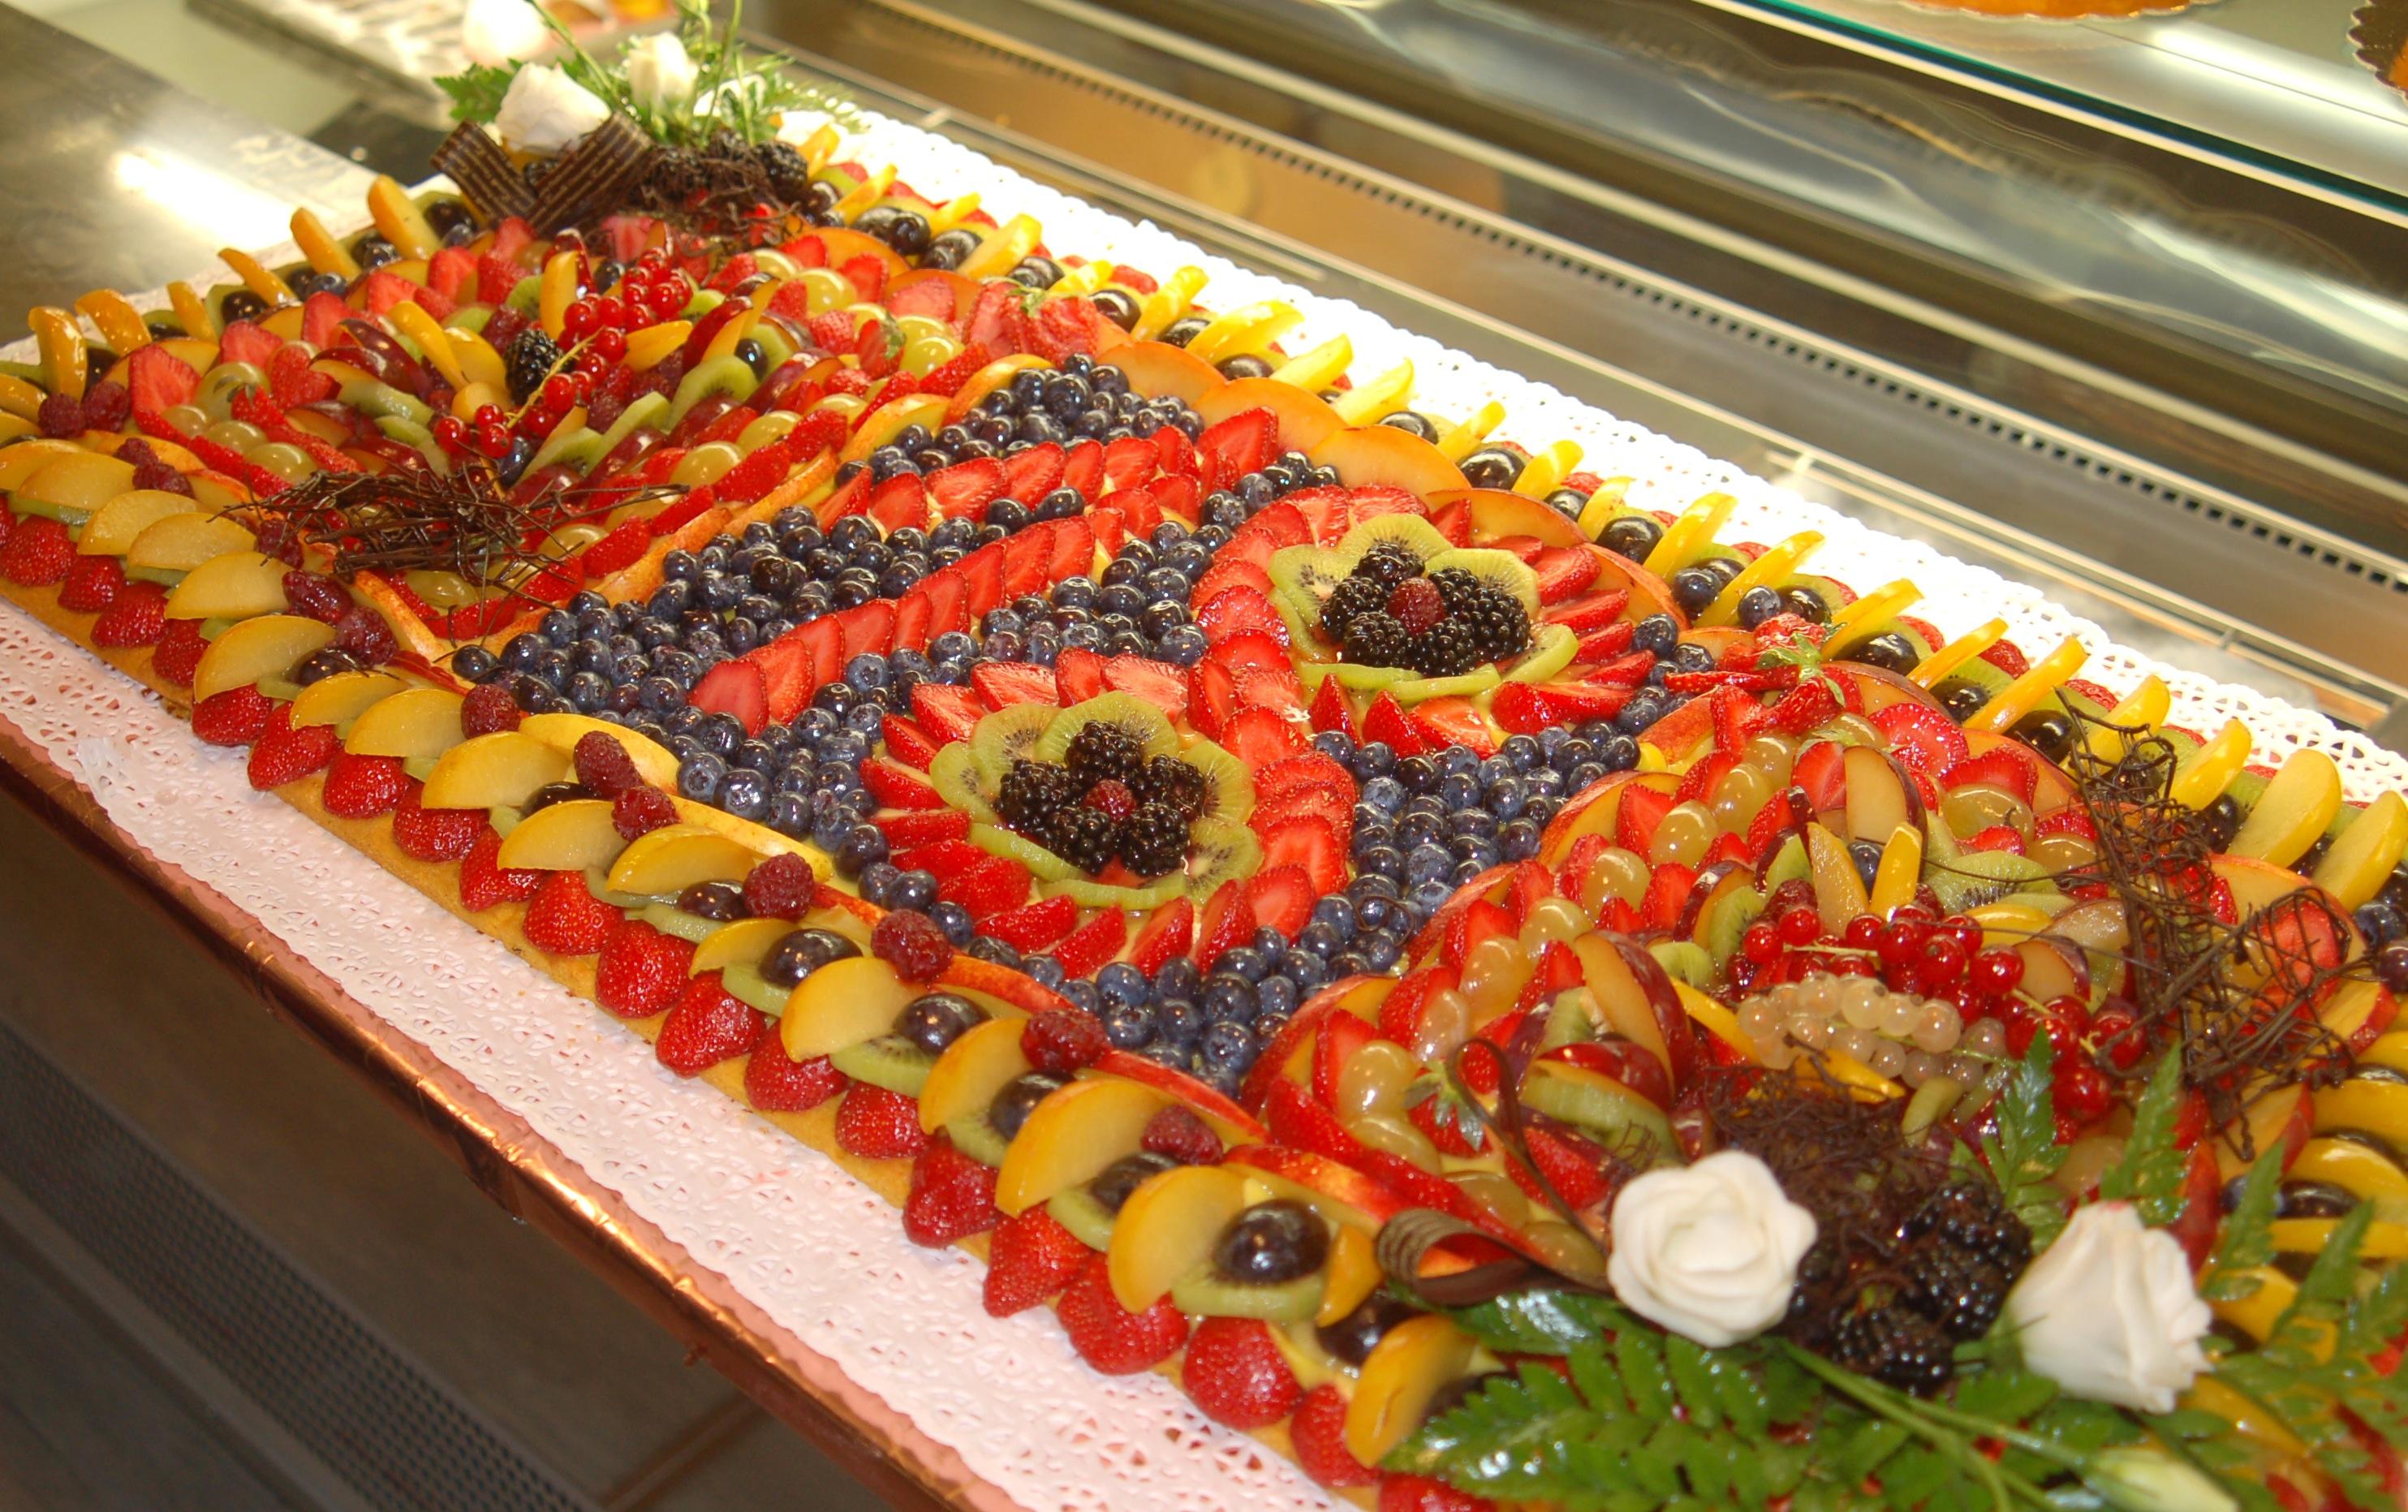 Buffet Di Dolci Per Bambini : Loano buffet dolci funfamily offerte vacanze con i bambini